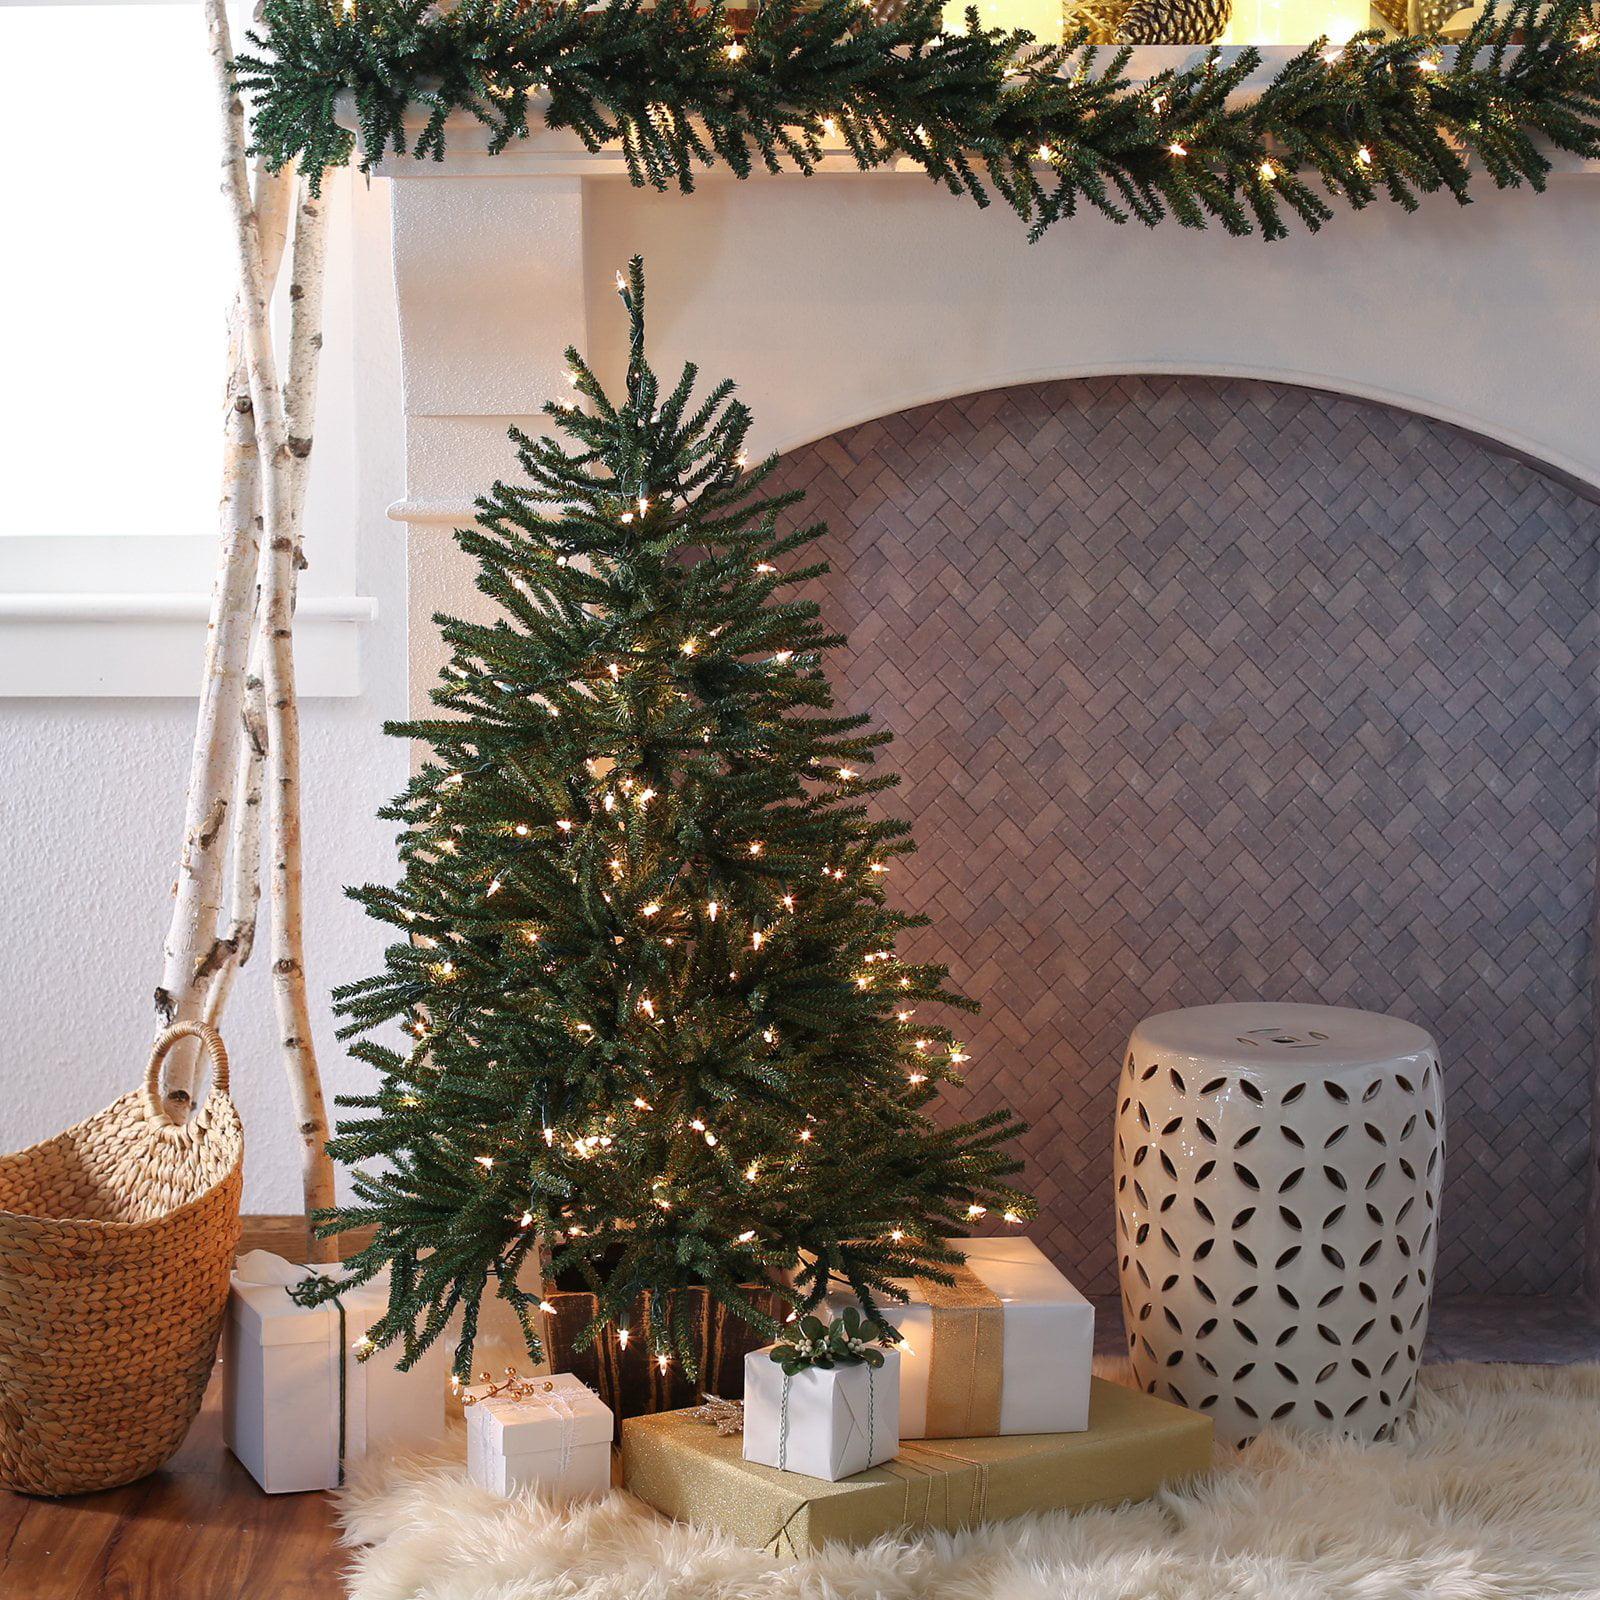 Finley Home 4 ft. Delicate Pine Slim Pre-Lit Christmas ...